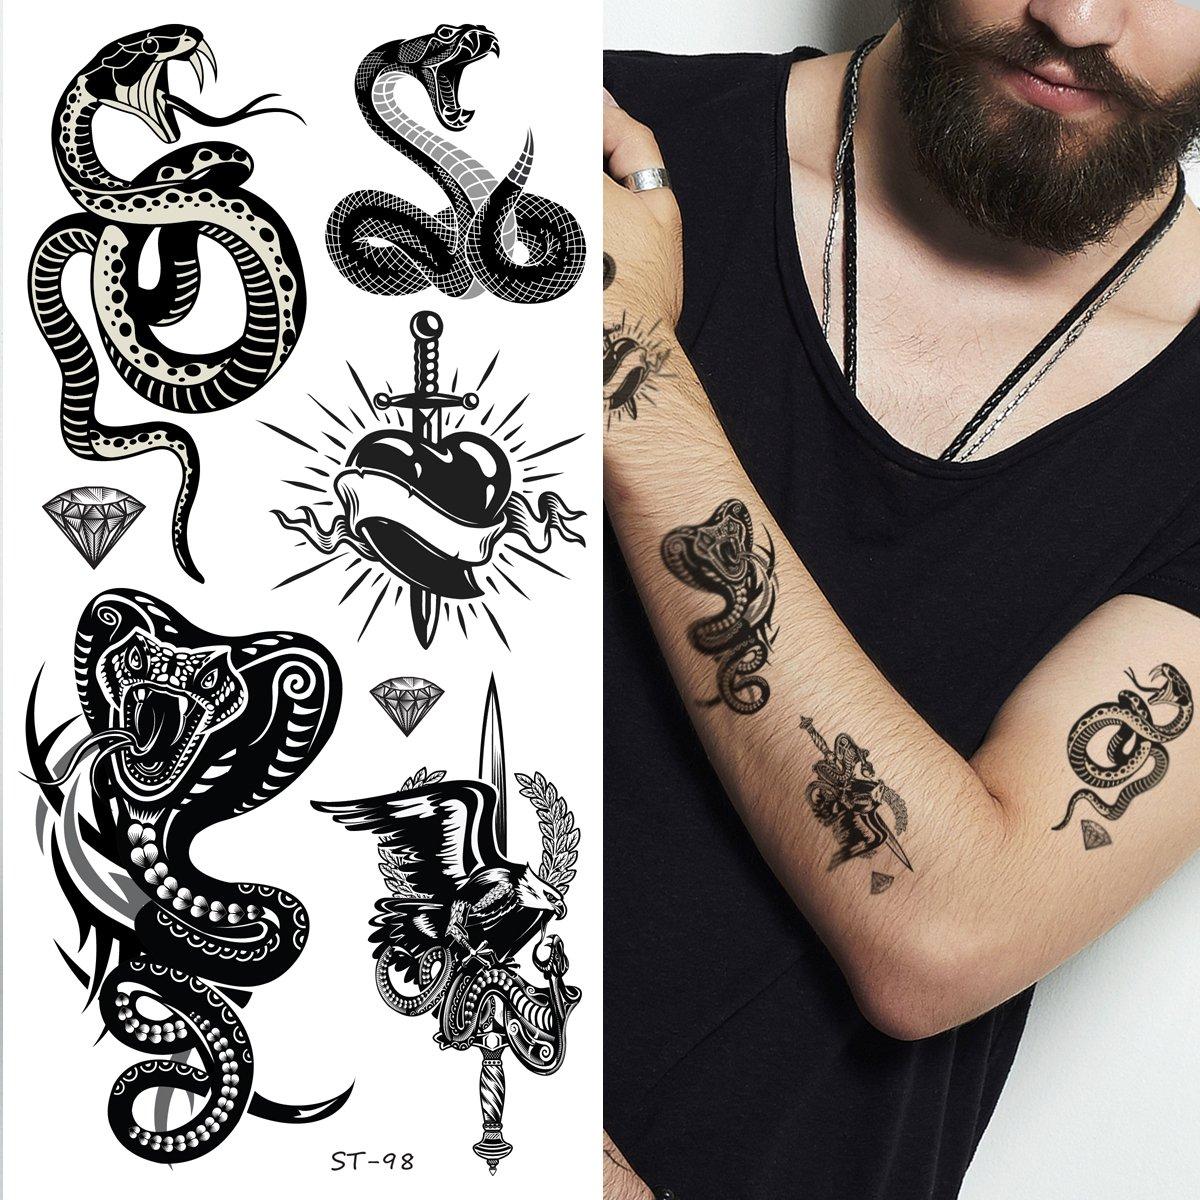 eeef49e3af730 Amazon.com : Supperb Mix Tribal Temporary Tattoos Tribal Snake II (Set of  2) : Beauty